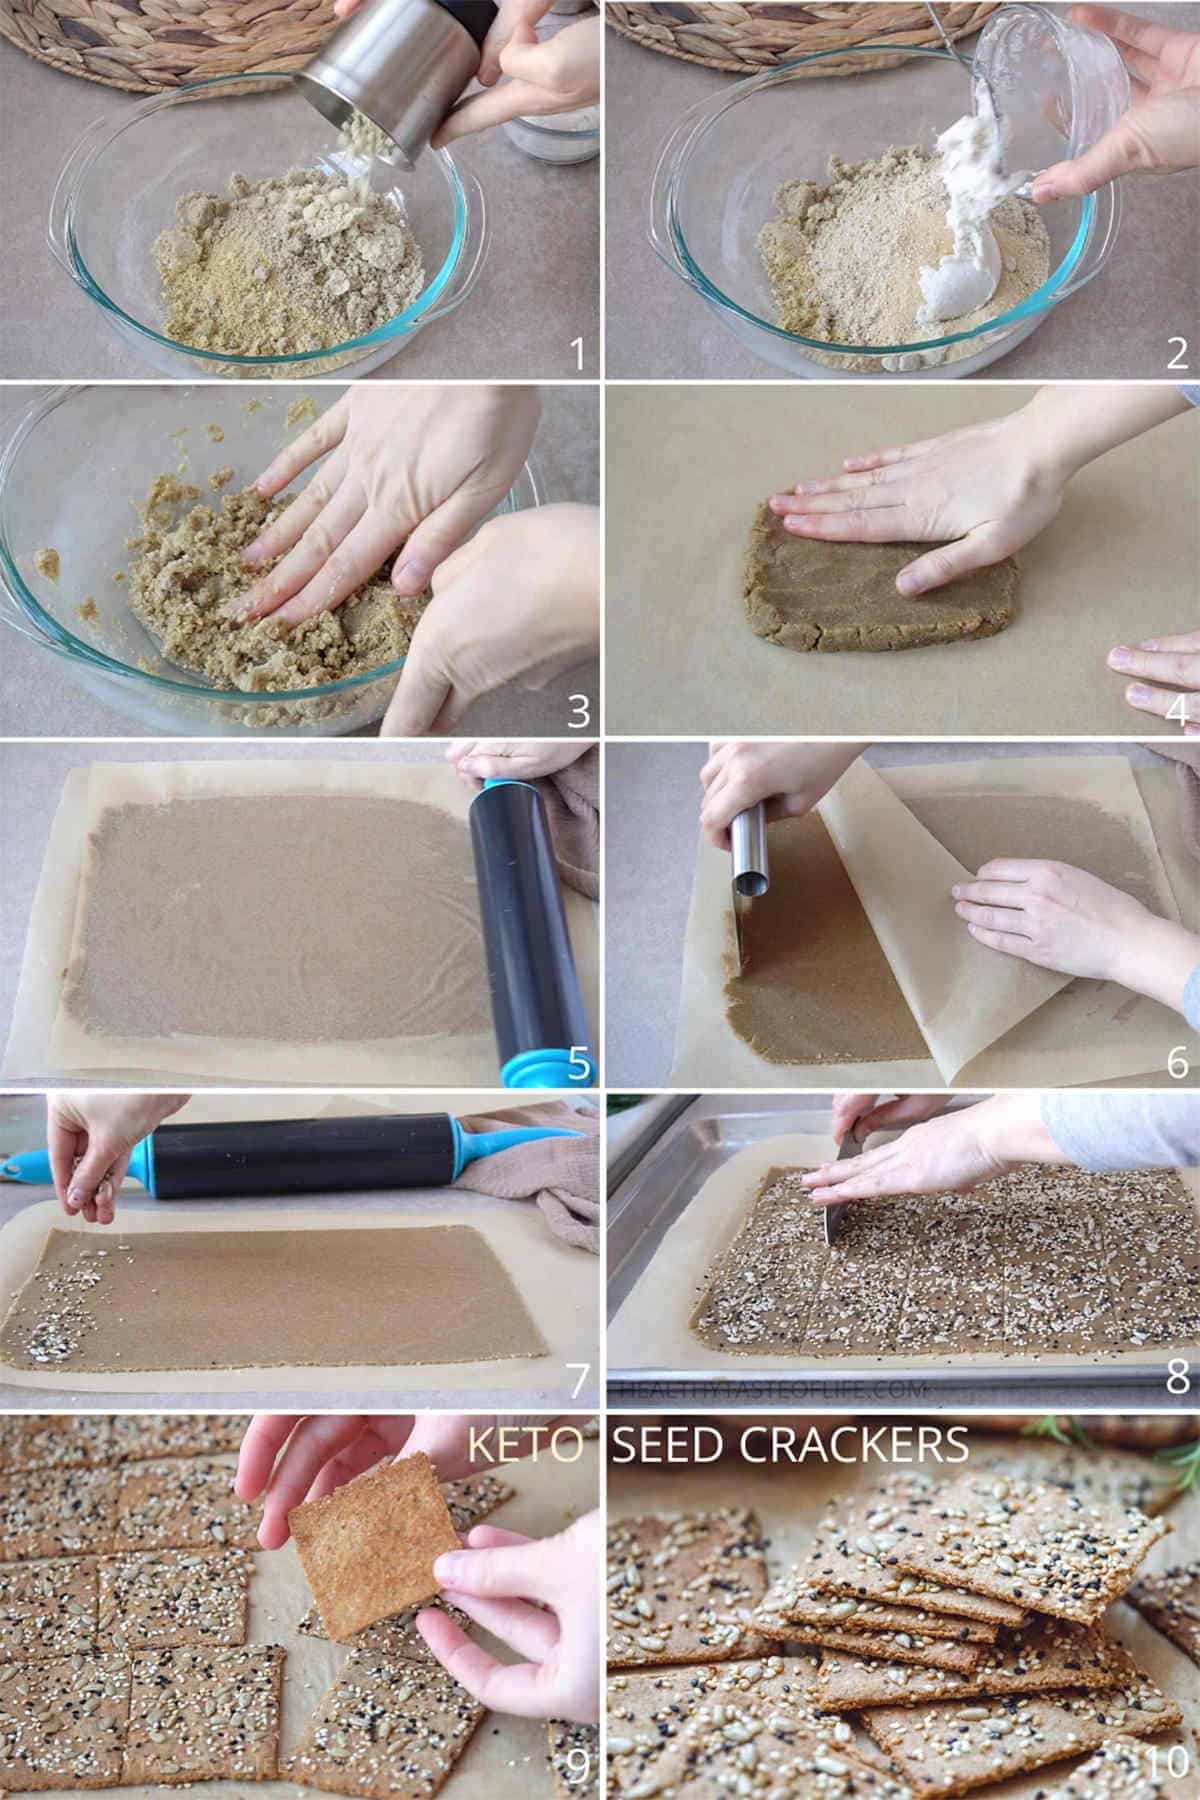 How To Make Keto Crackers. Keto Seed Crackers, Vegan, Low Crab, Nut Free, Gluten Free, Dairy Free, Grain Free Recipe